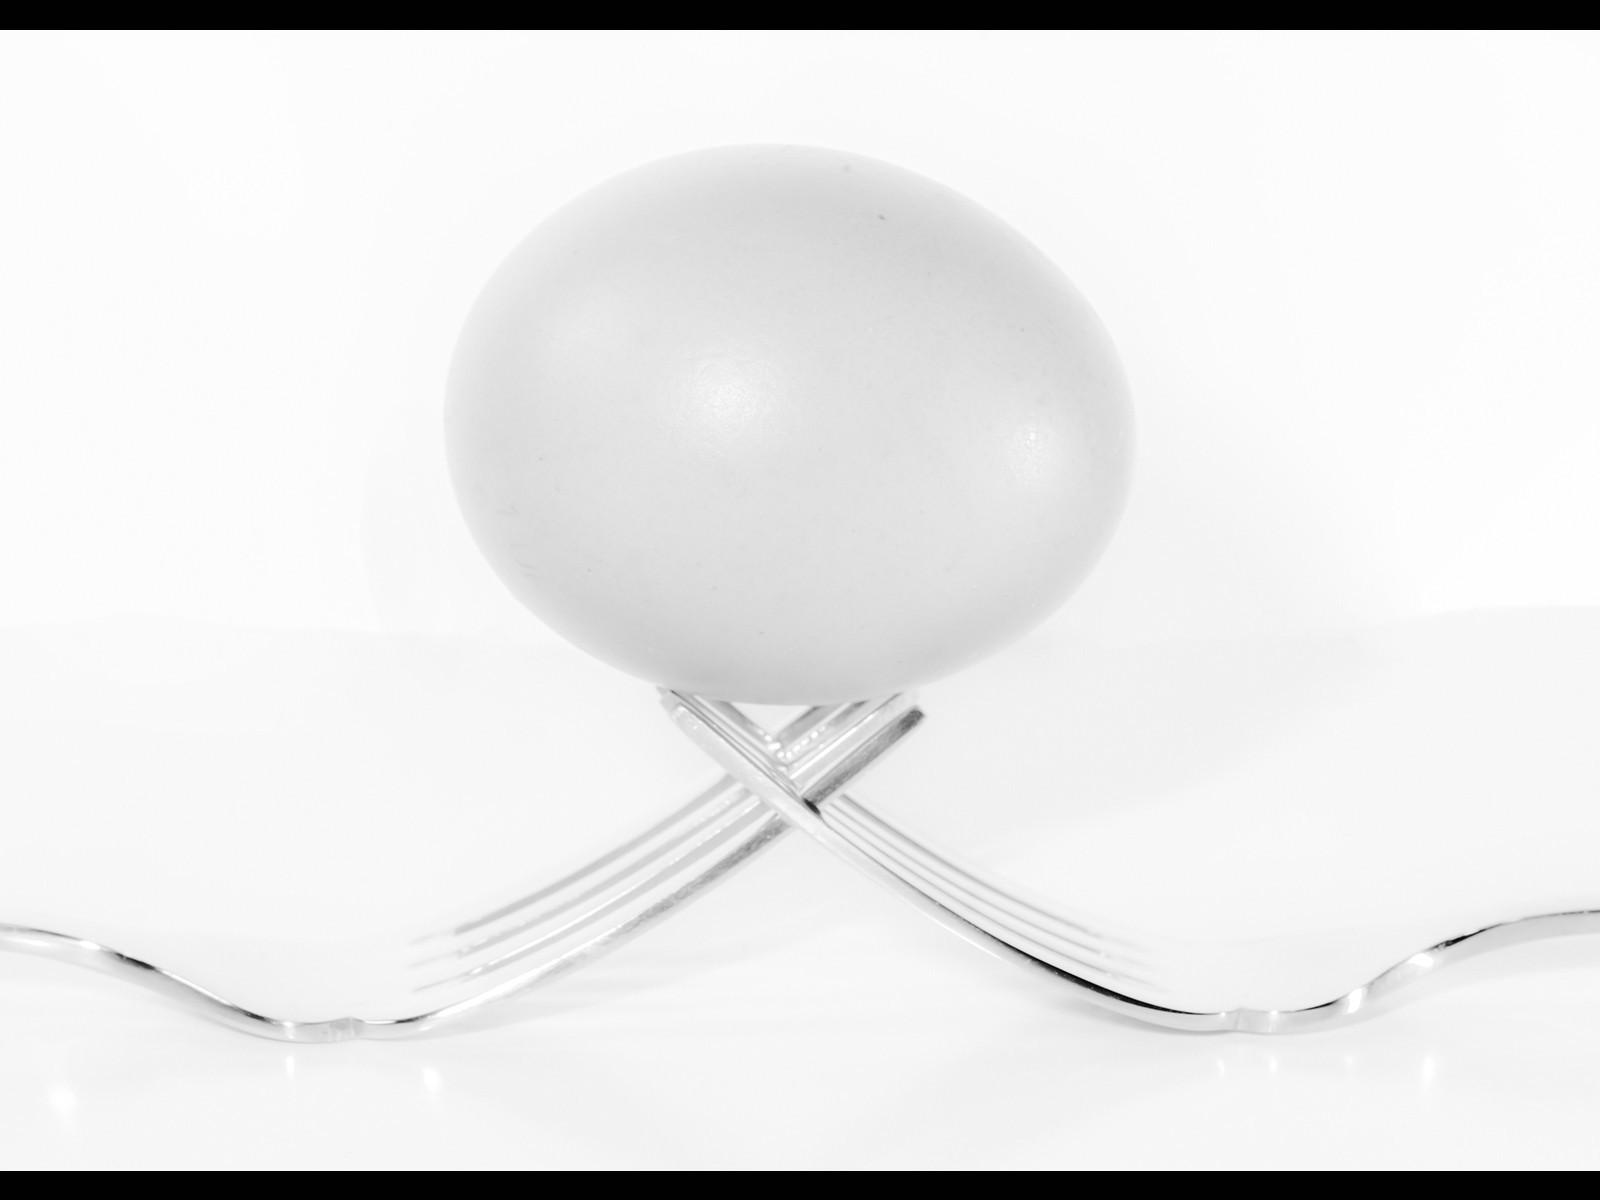 6.Eggtastic